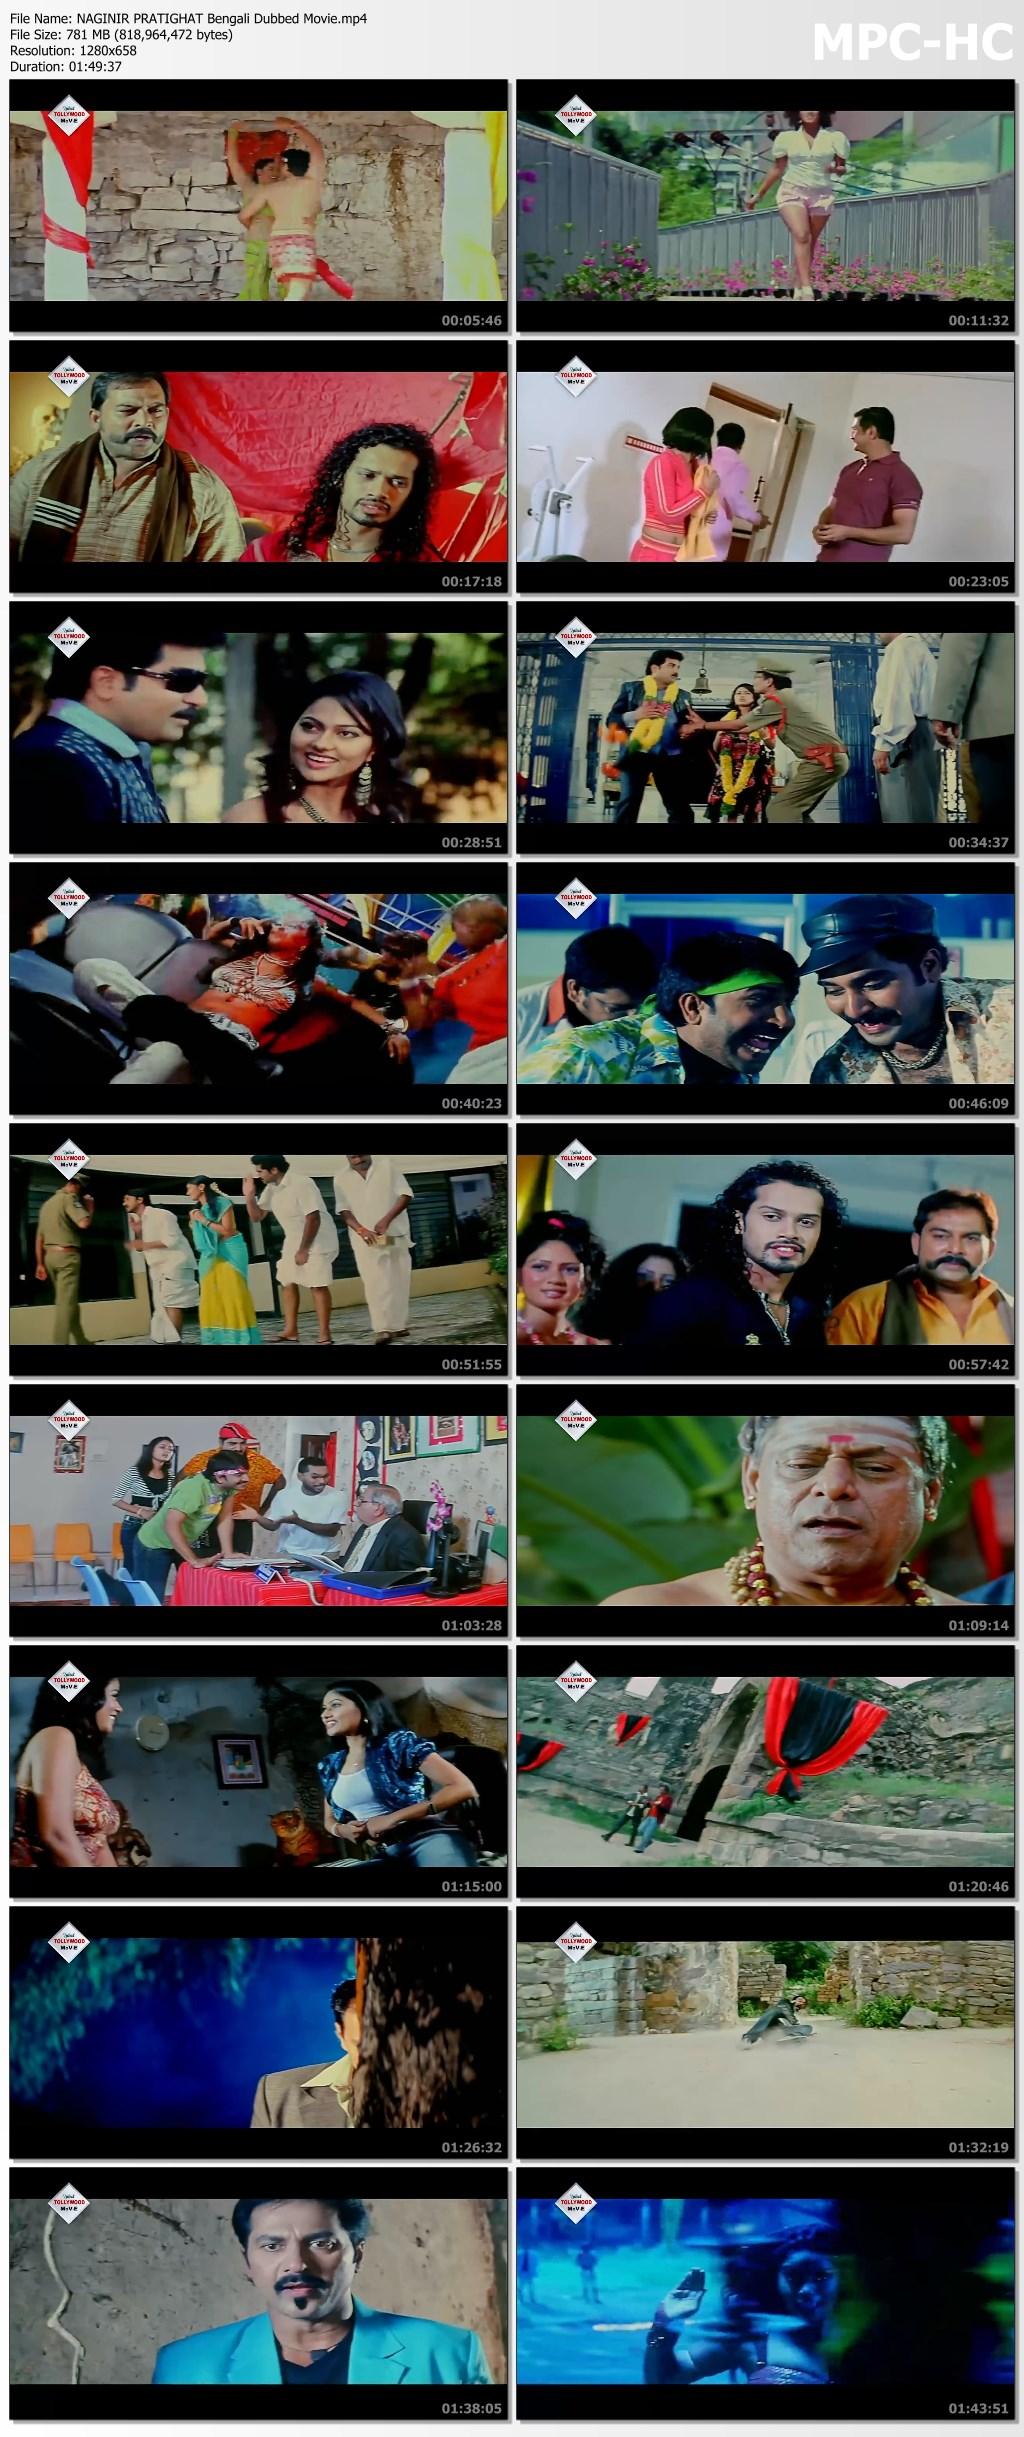 NAGINIR PRATIGHAT Bengali Dubbed Movie.mp4 thumbs